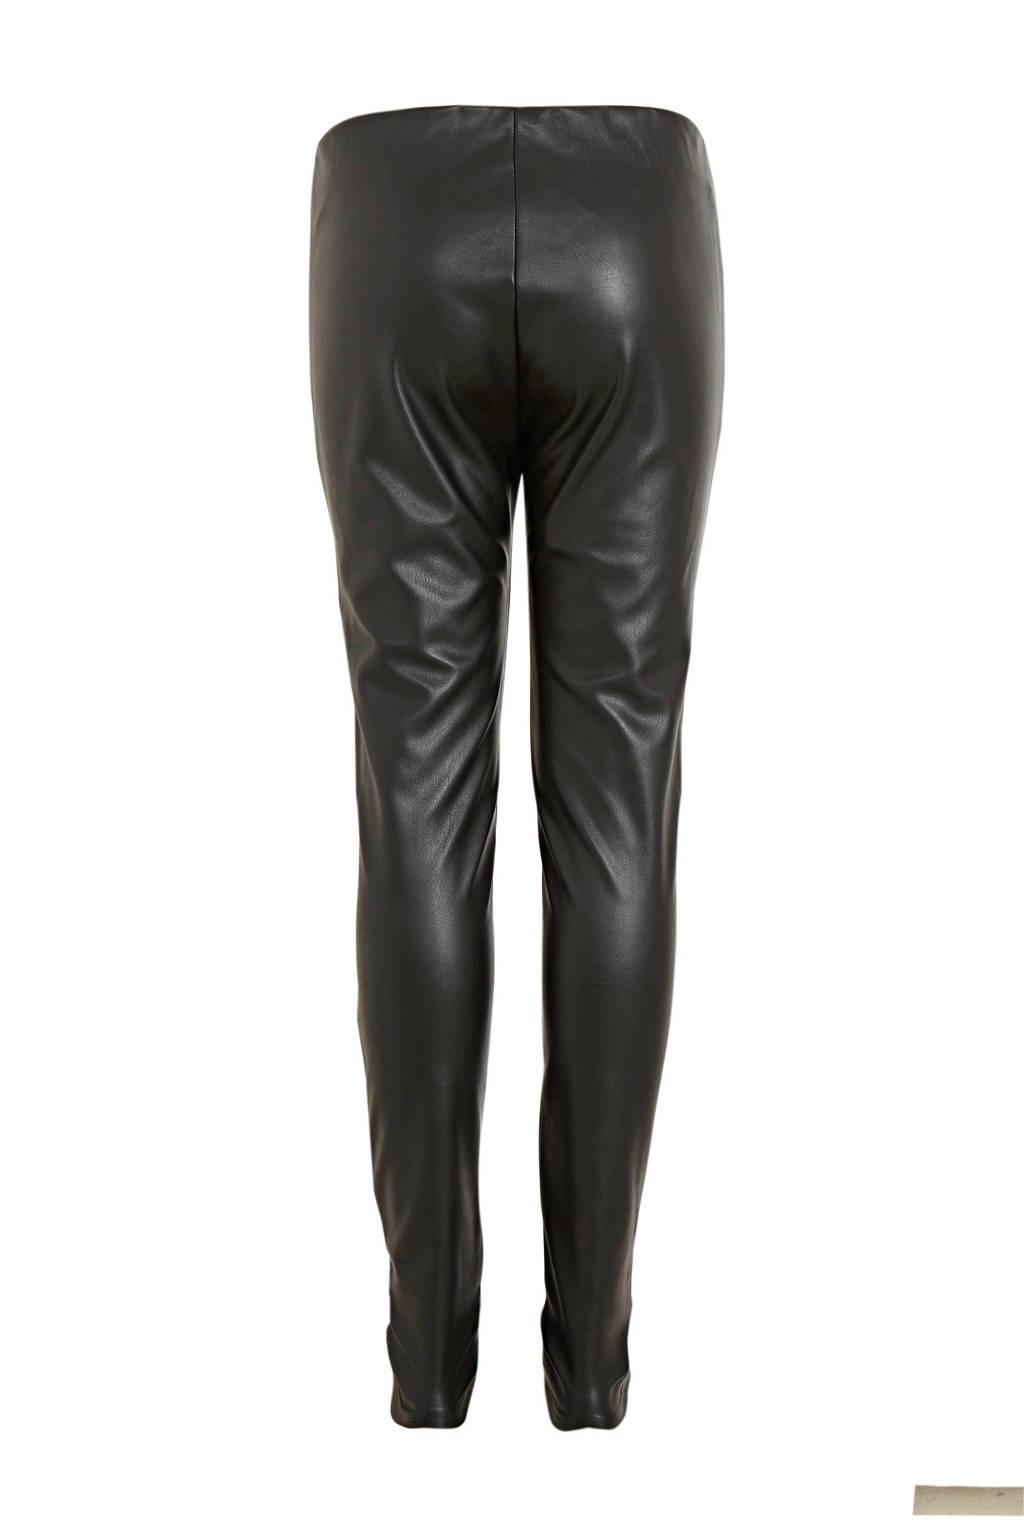 s.Oliver imitatieleren legging zwart, Zwart